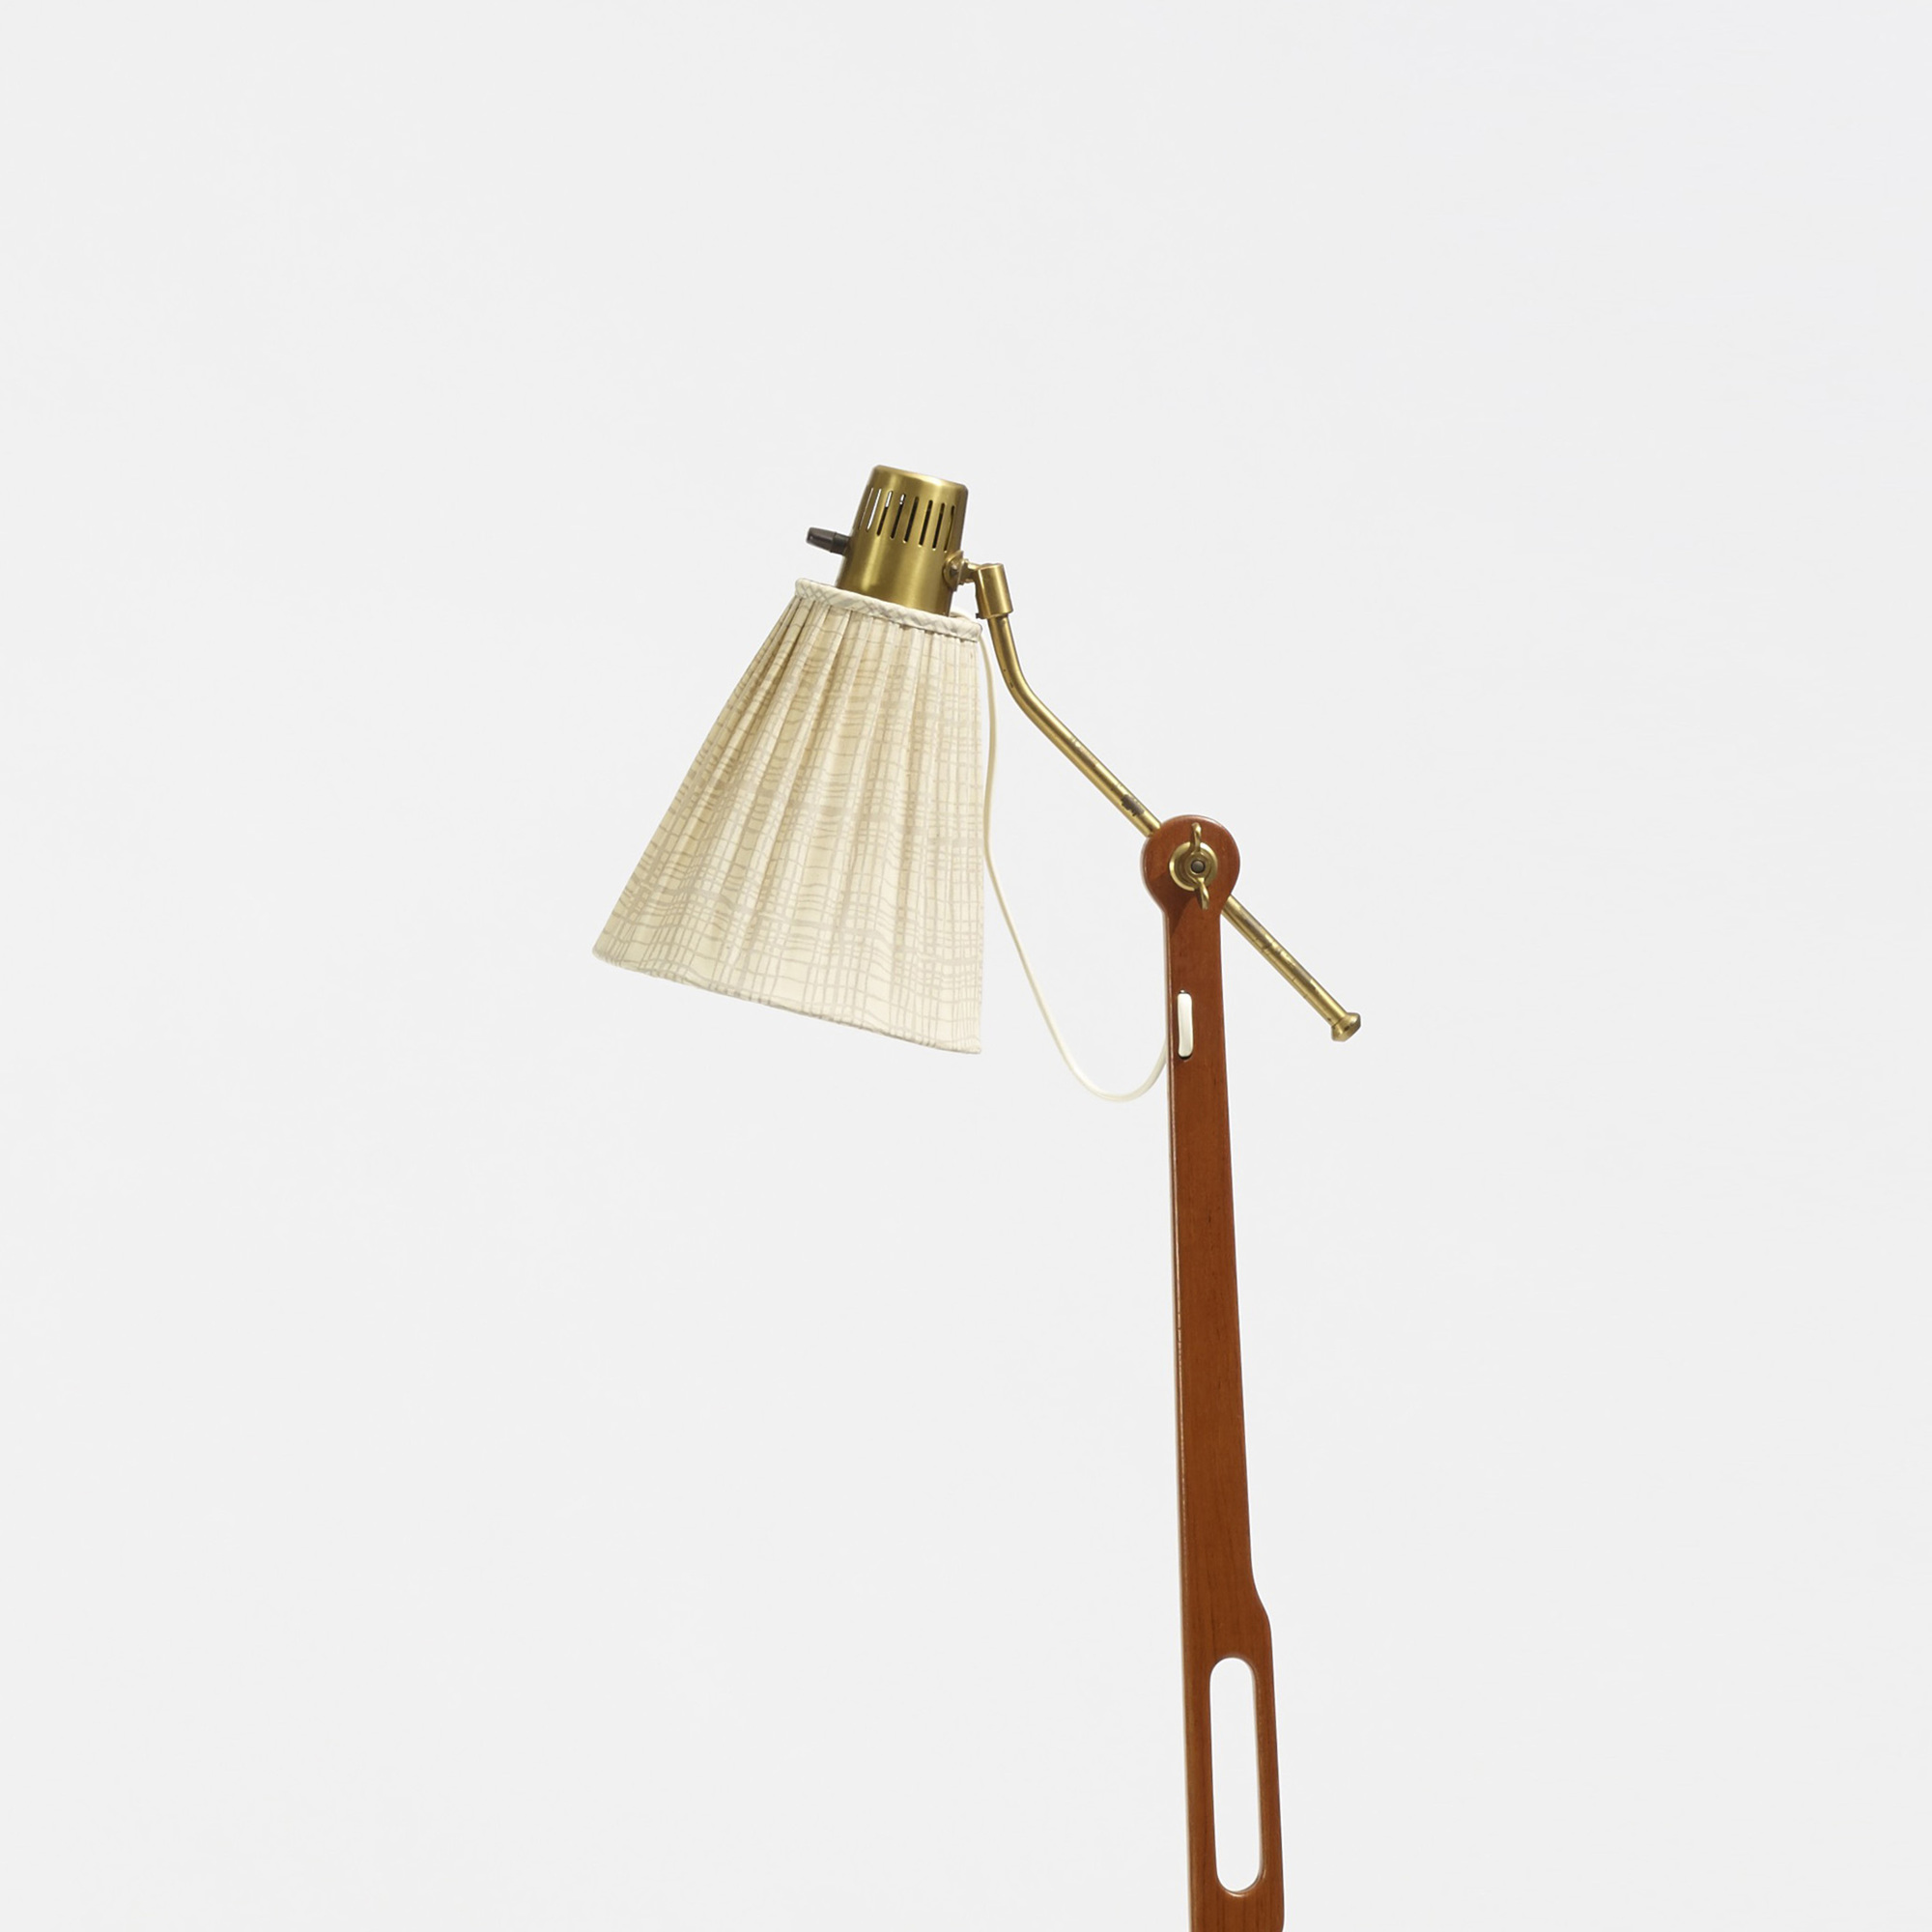 190: Hans Bergström / rare floor lamp (2 of 2)